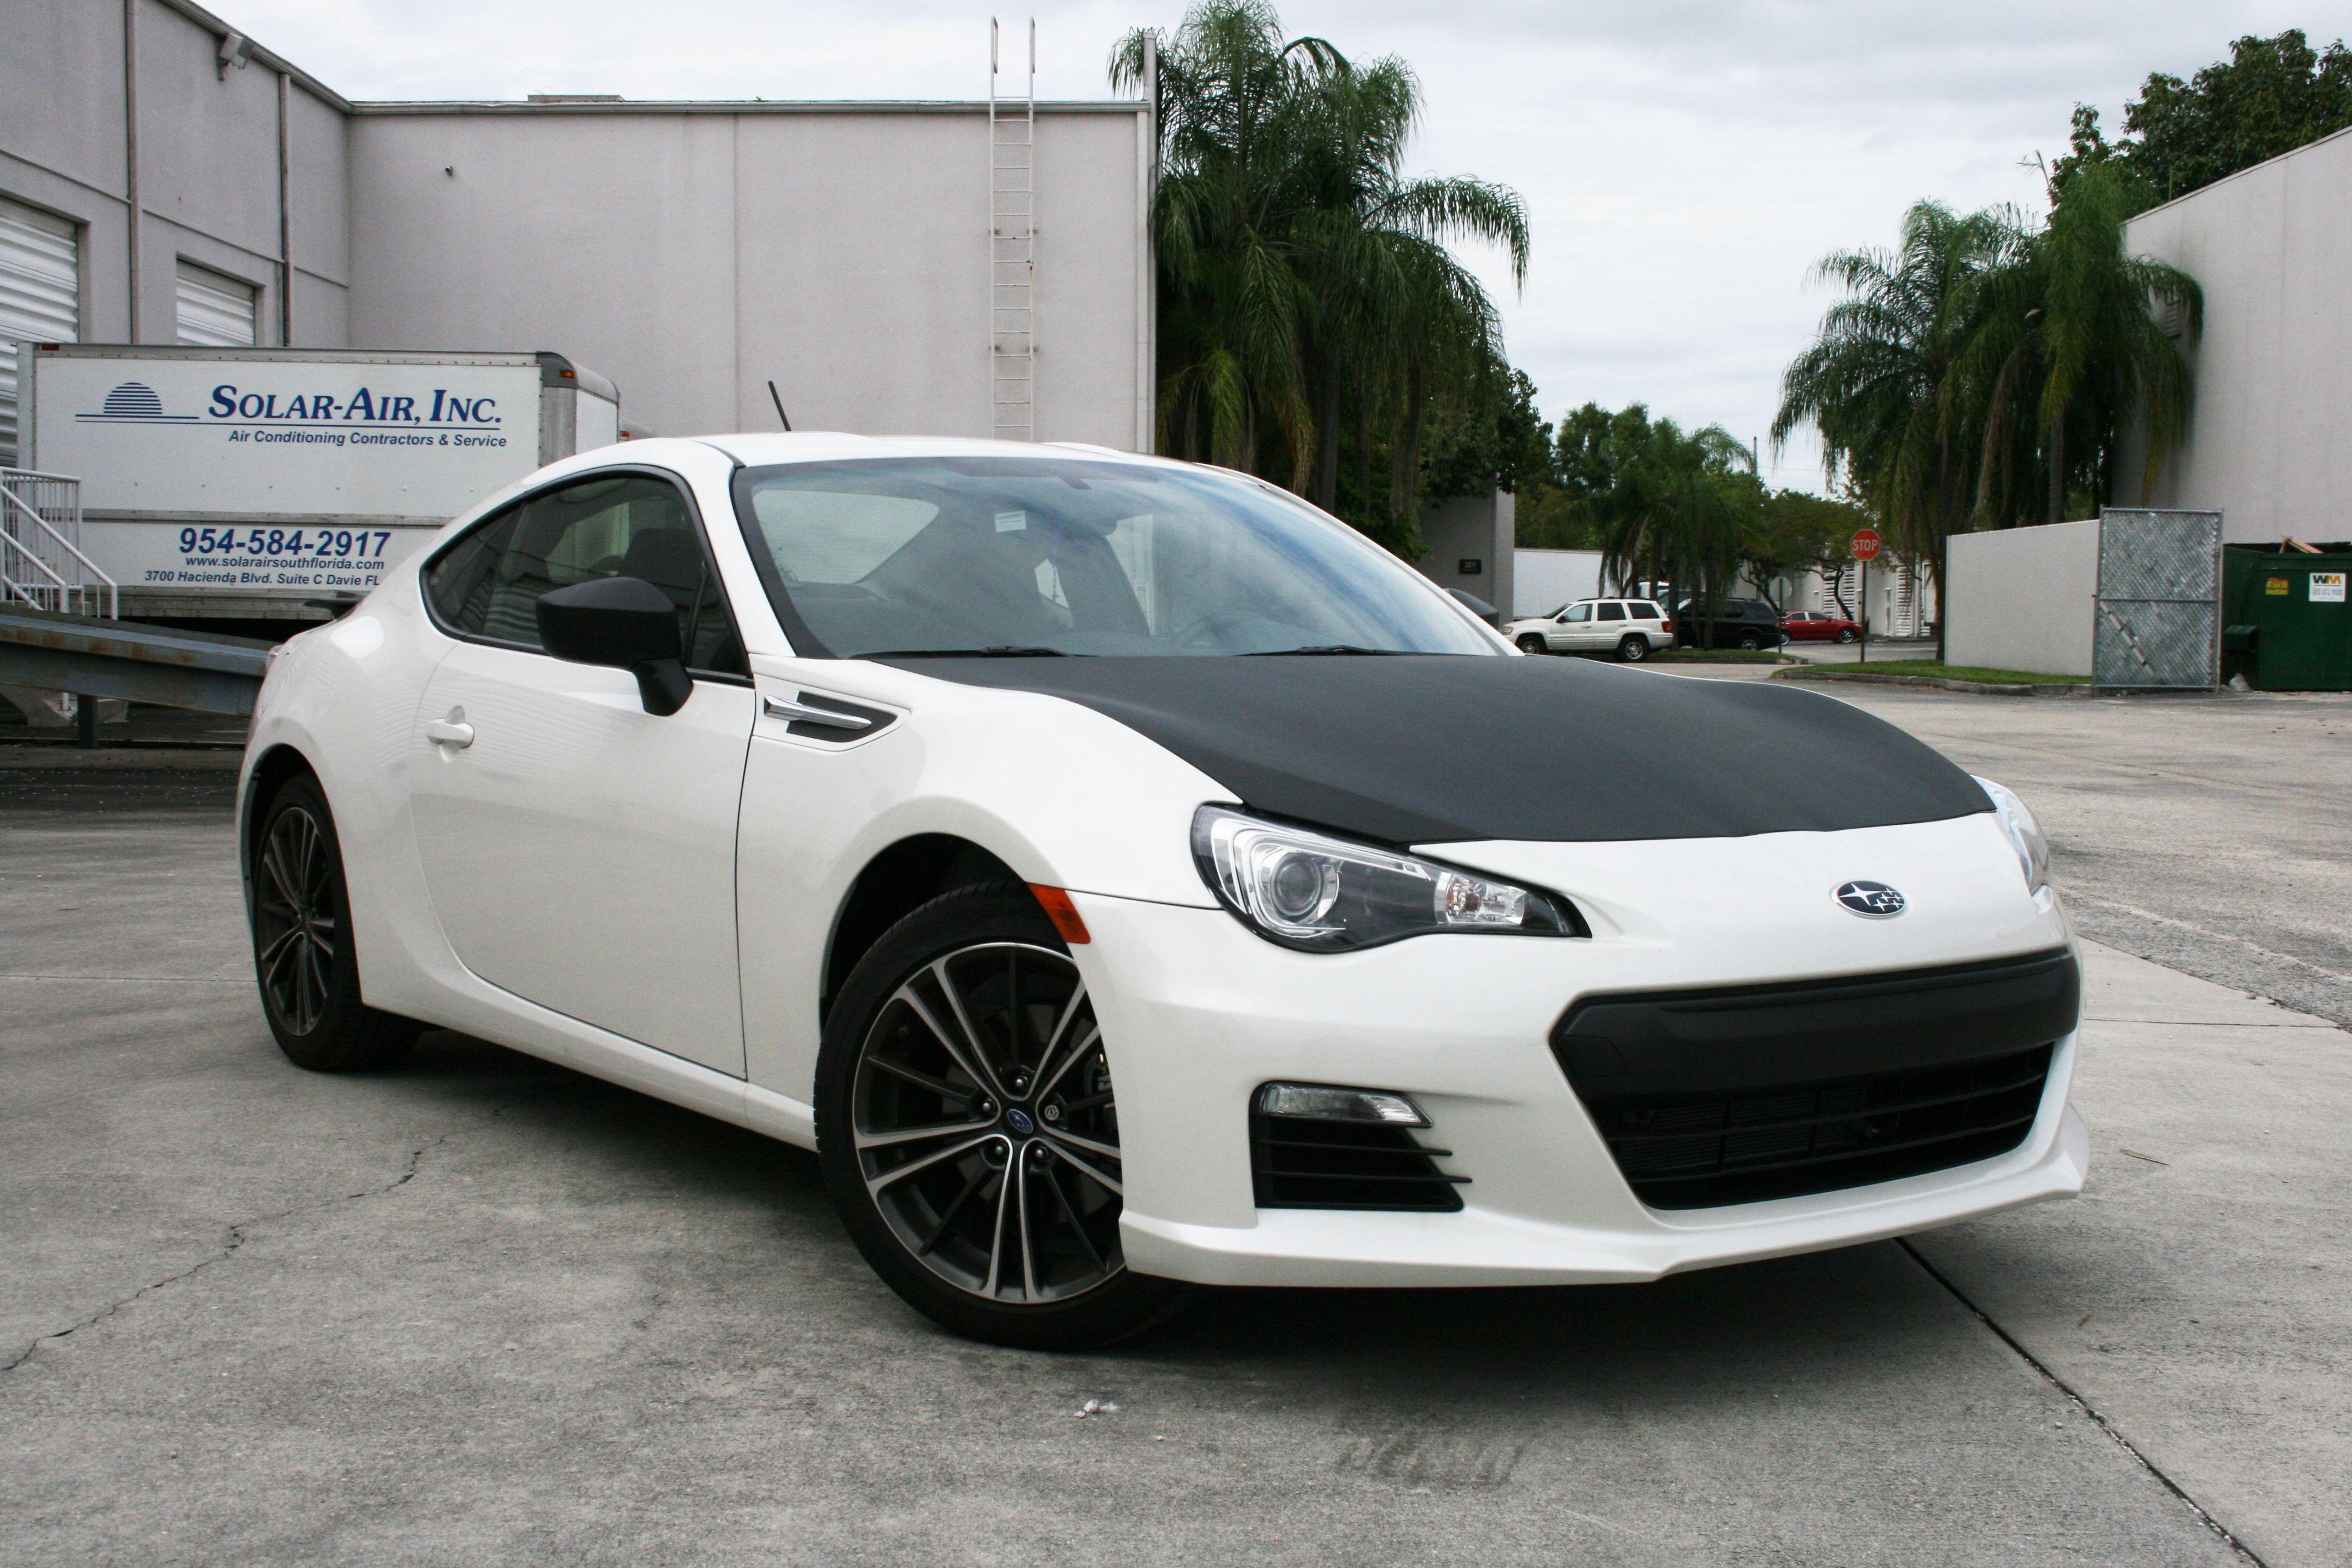 Miami subaru brz custom carbon fiber wrapped hood mirrors http carwrapsolutions